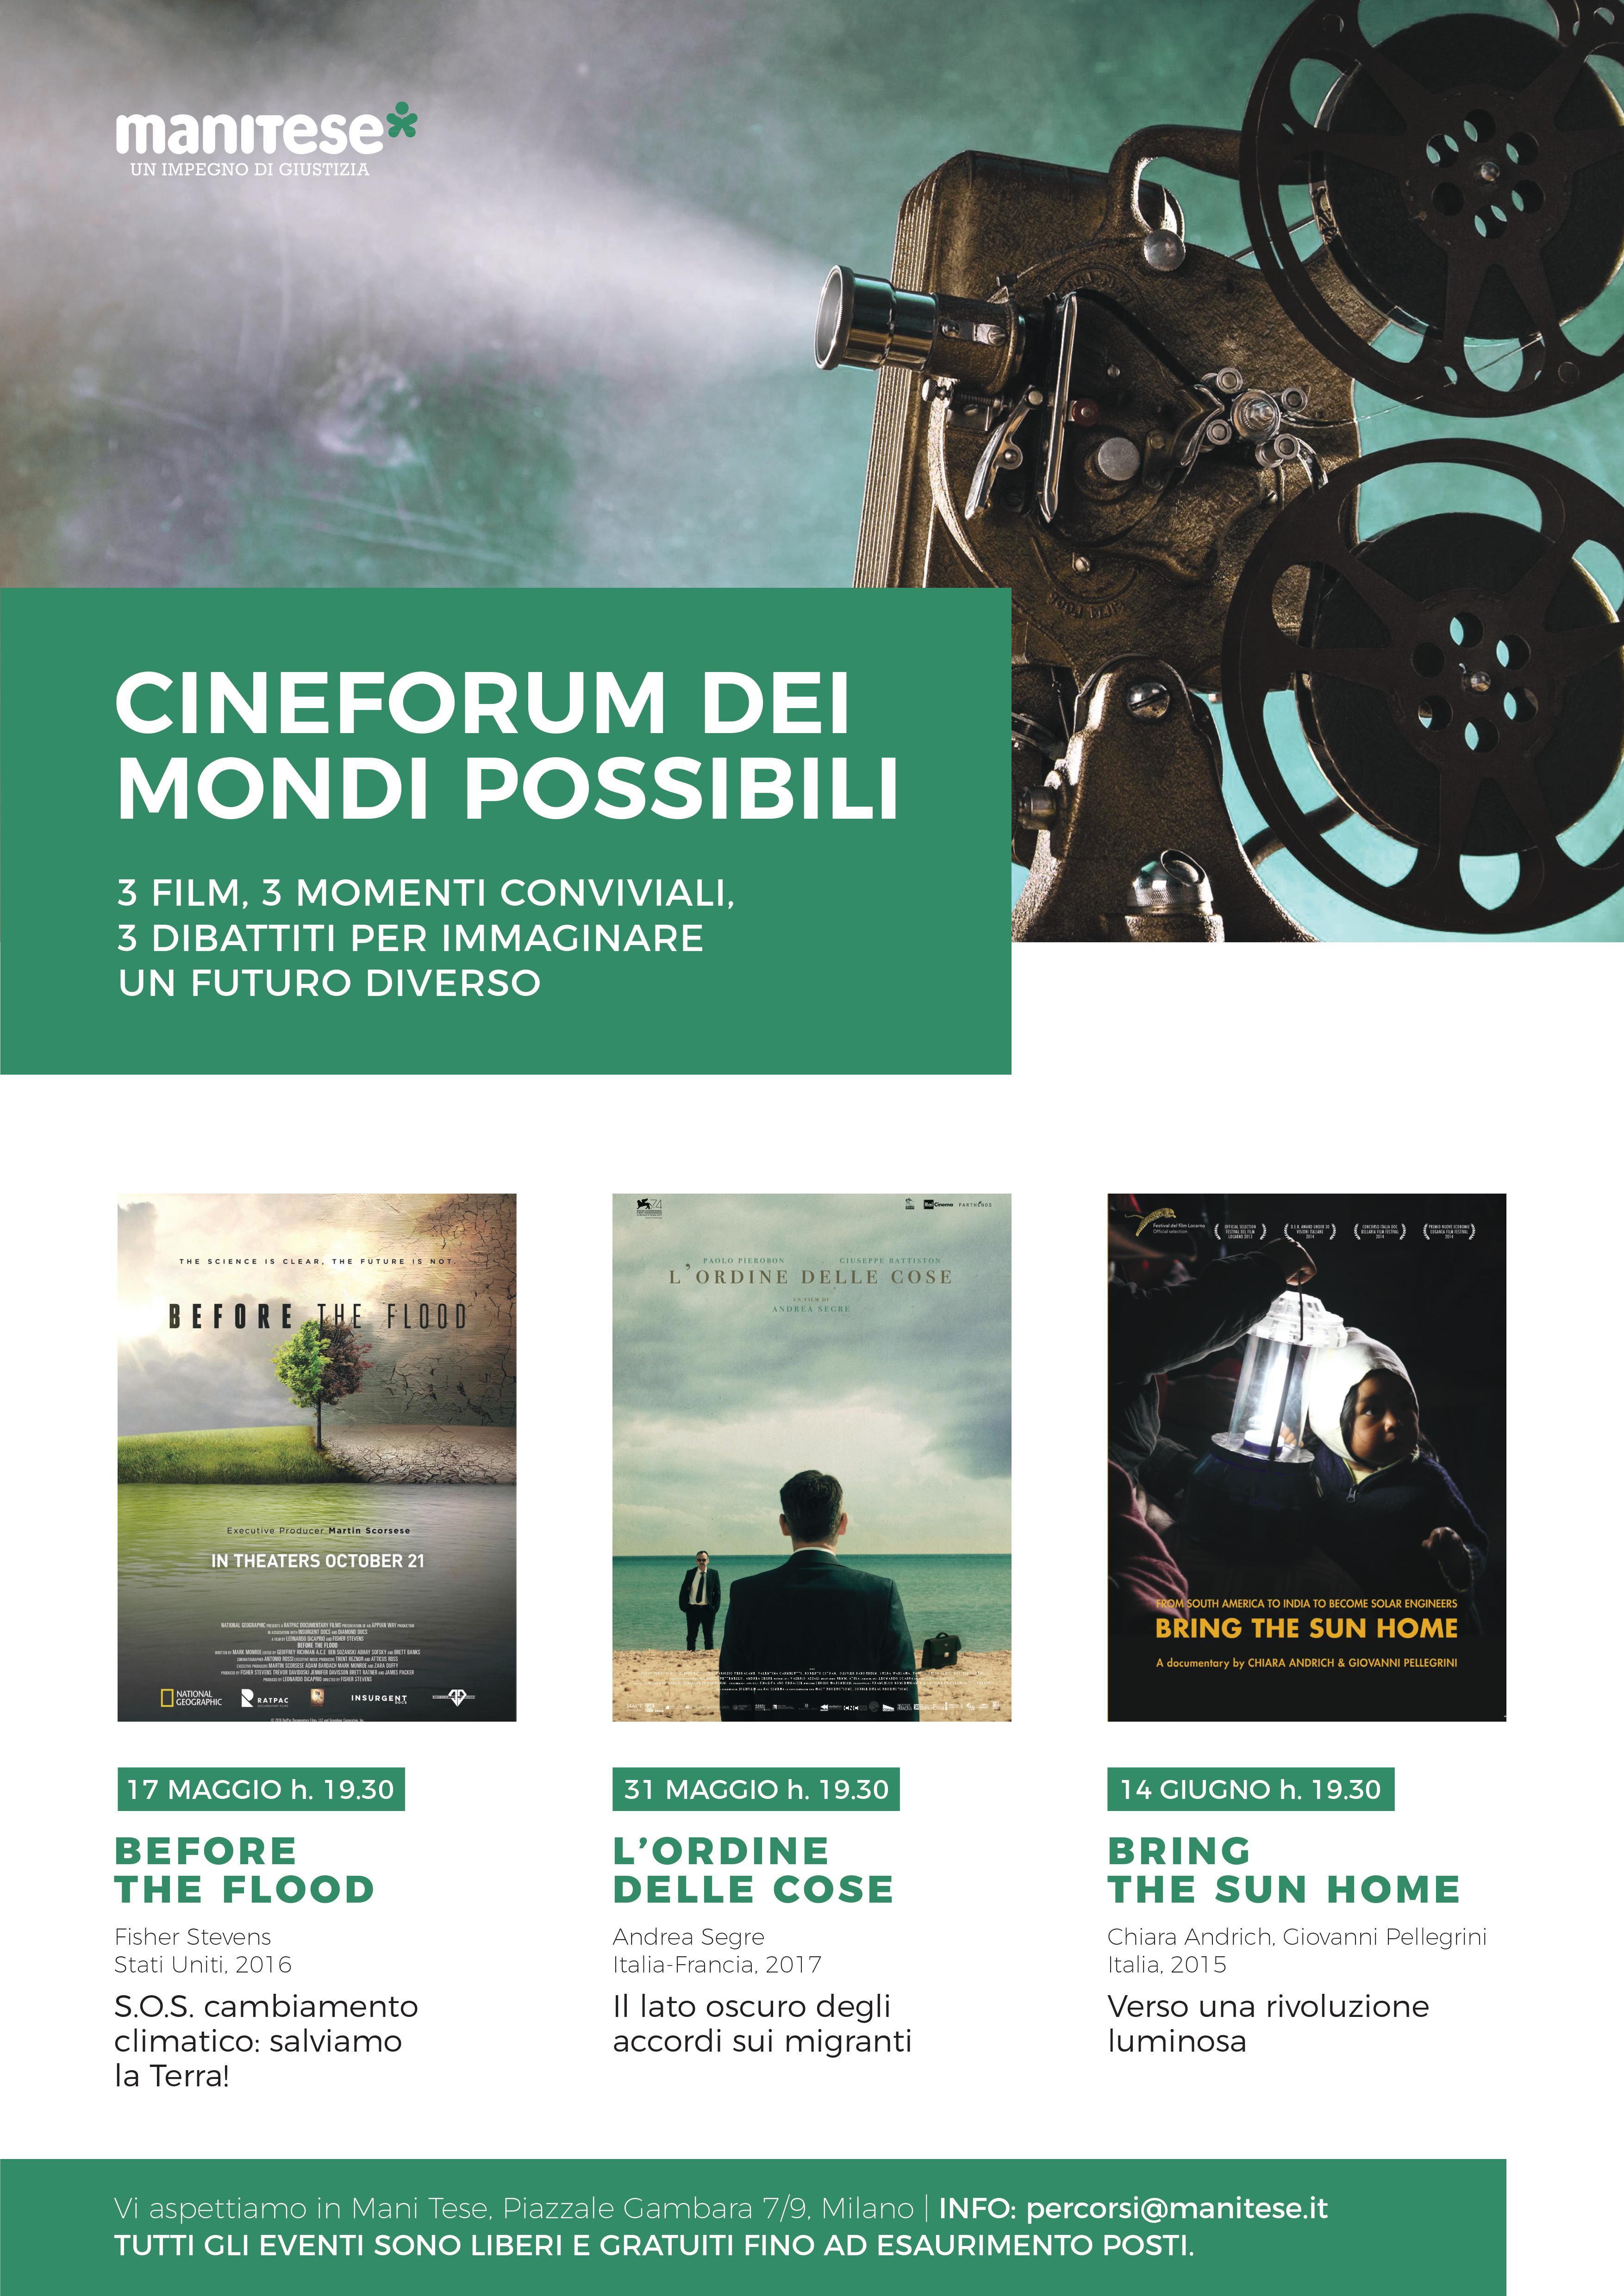 cineforum_locandina_mani tese_2018